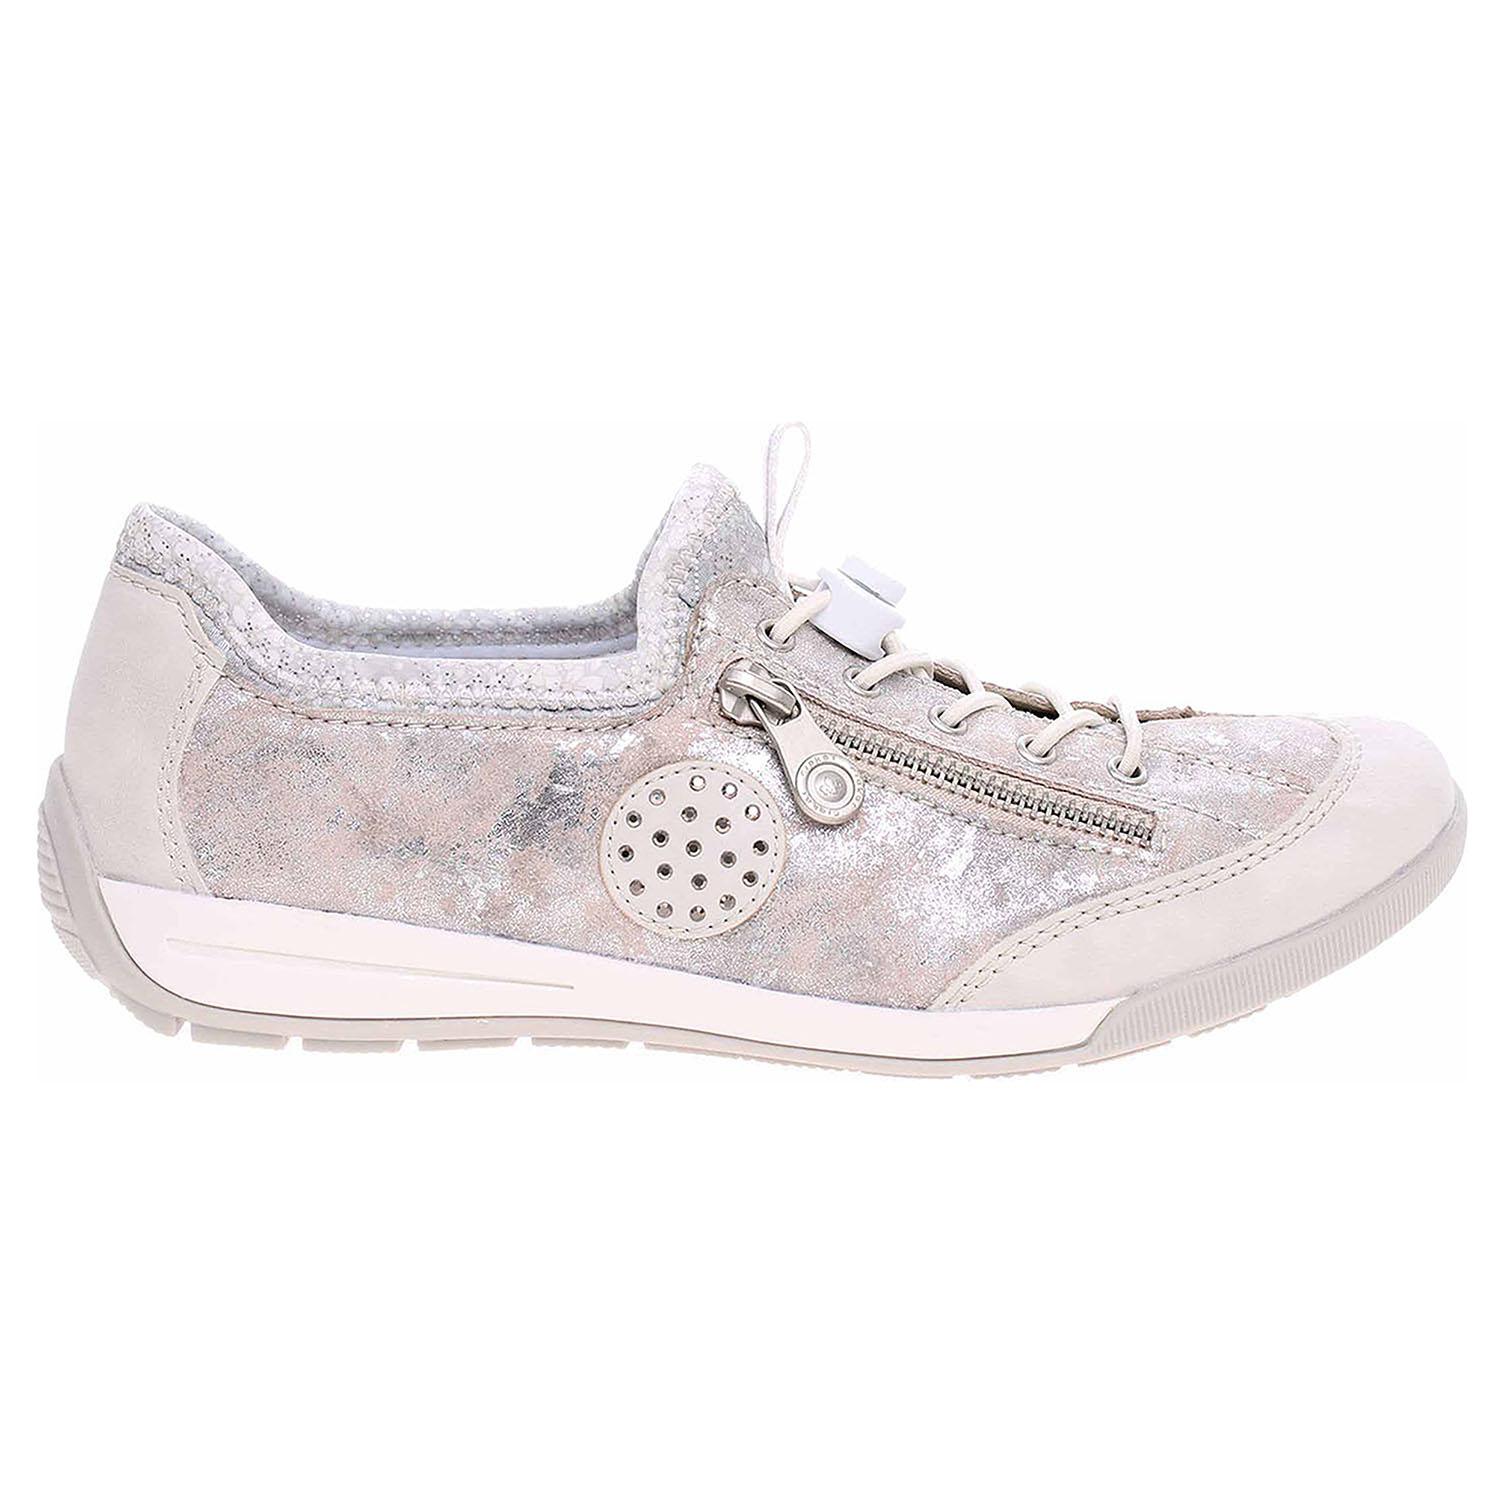 4a861cfdb23 Ecco Rieker dámská obuv M3063-81 weiss kombi 23200909